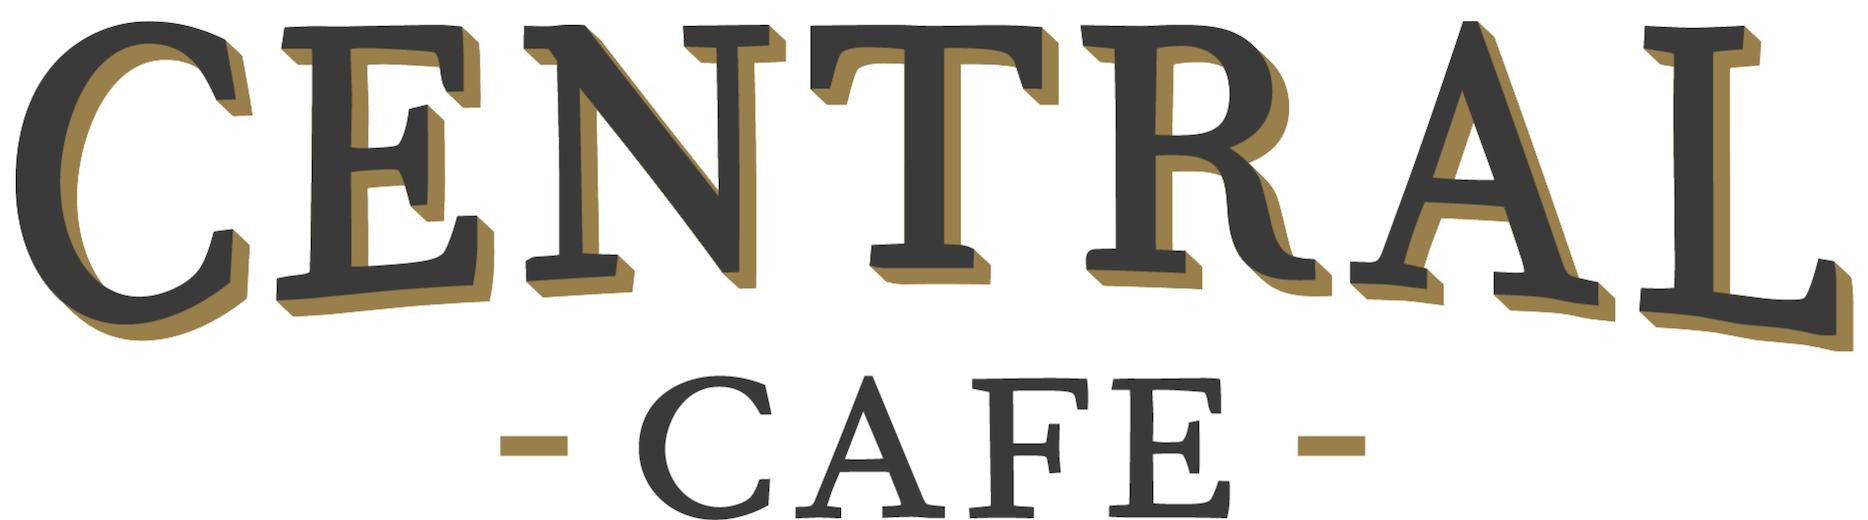 Local Coffee shop in Cheyenne Wyoming